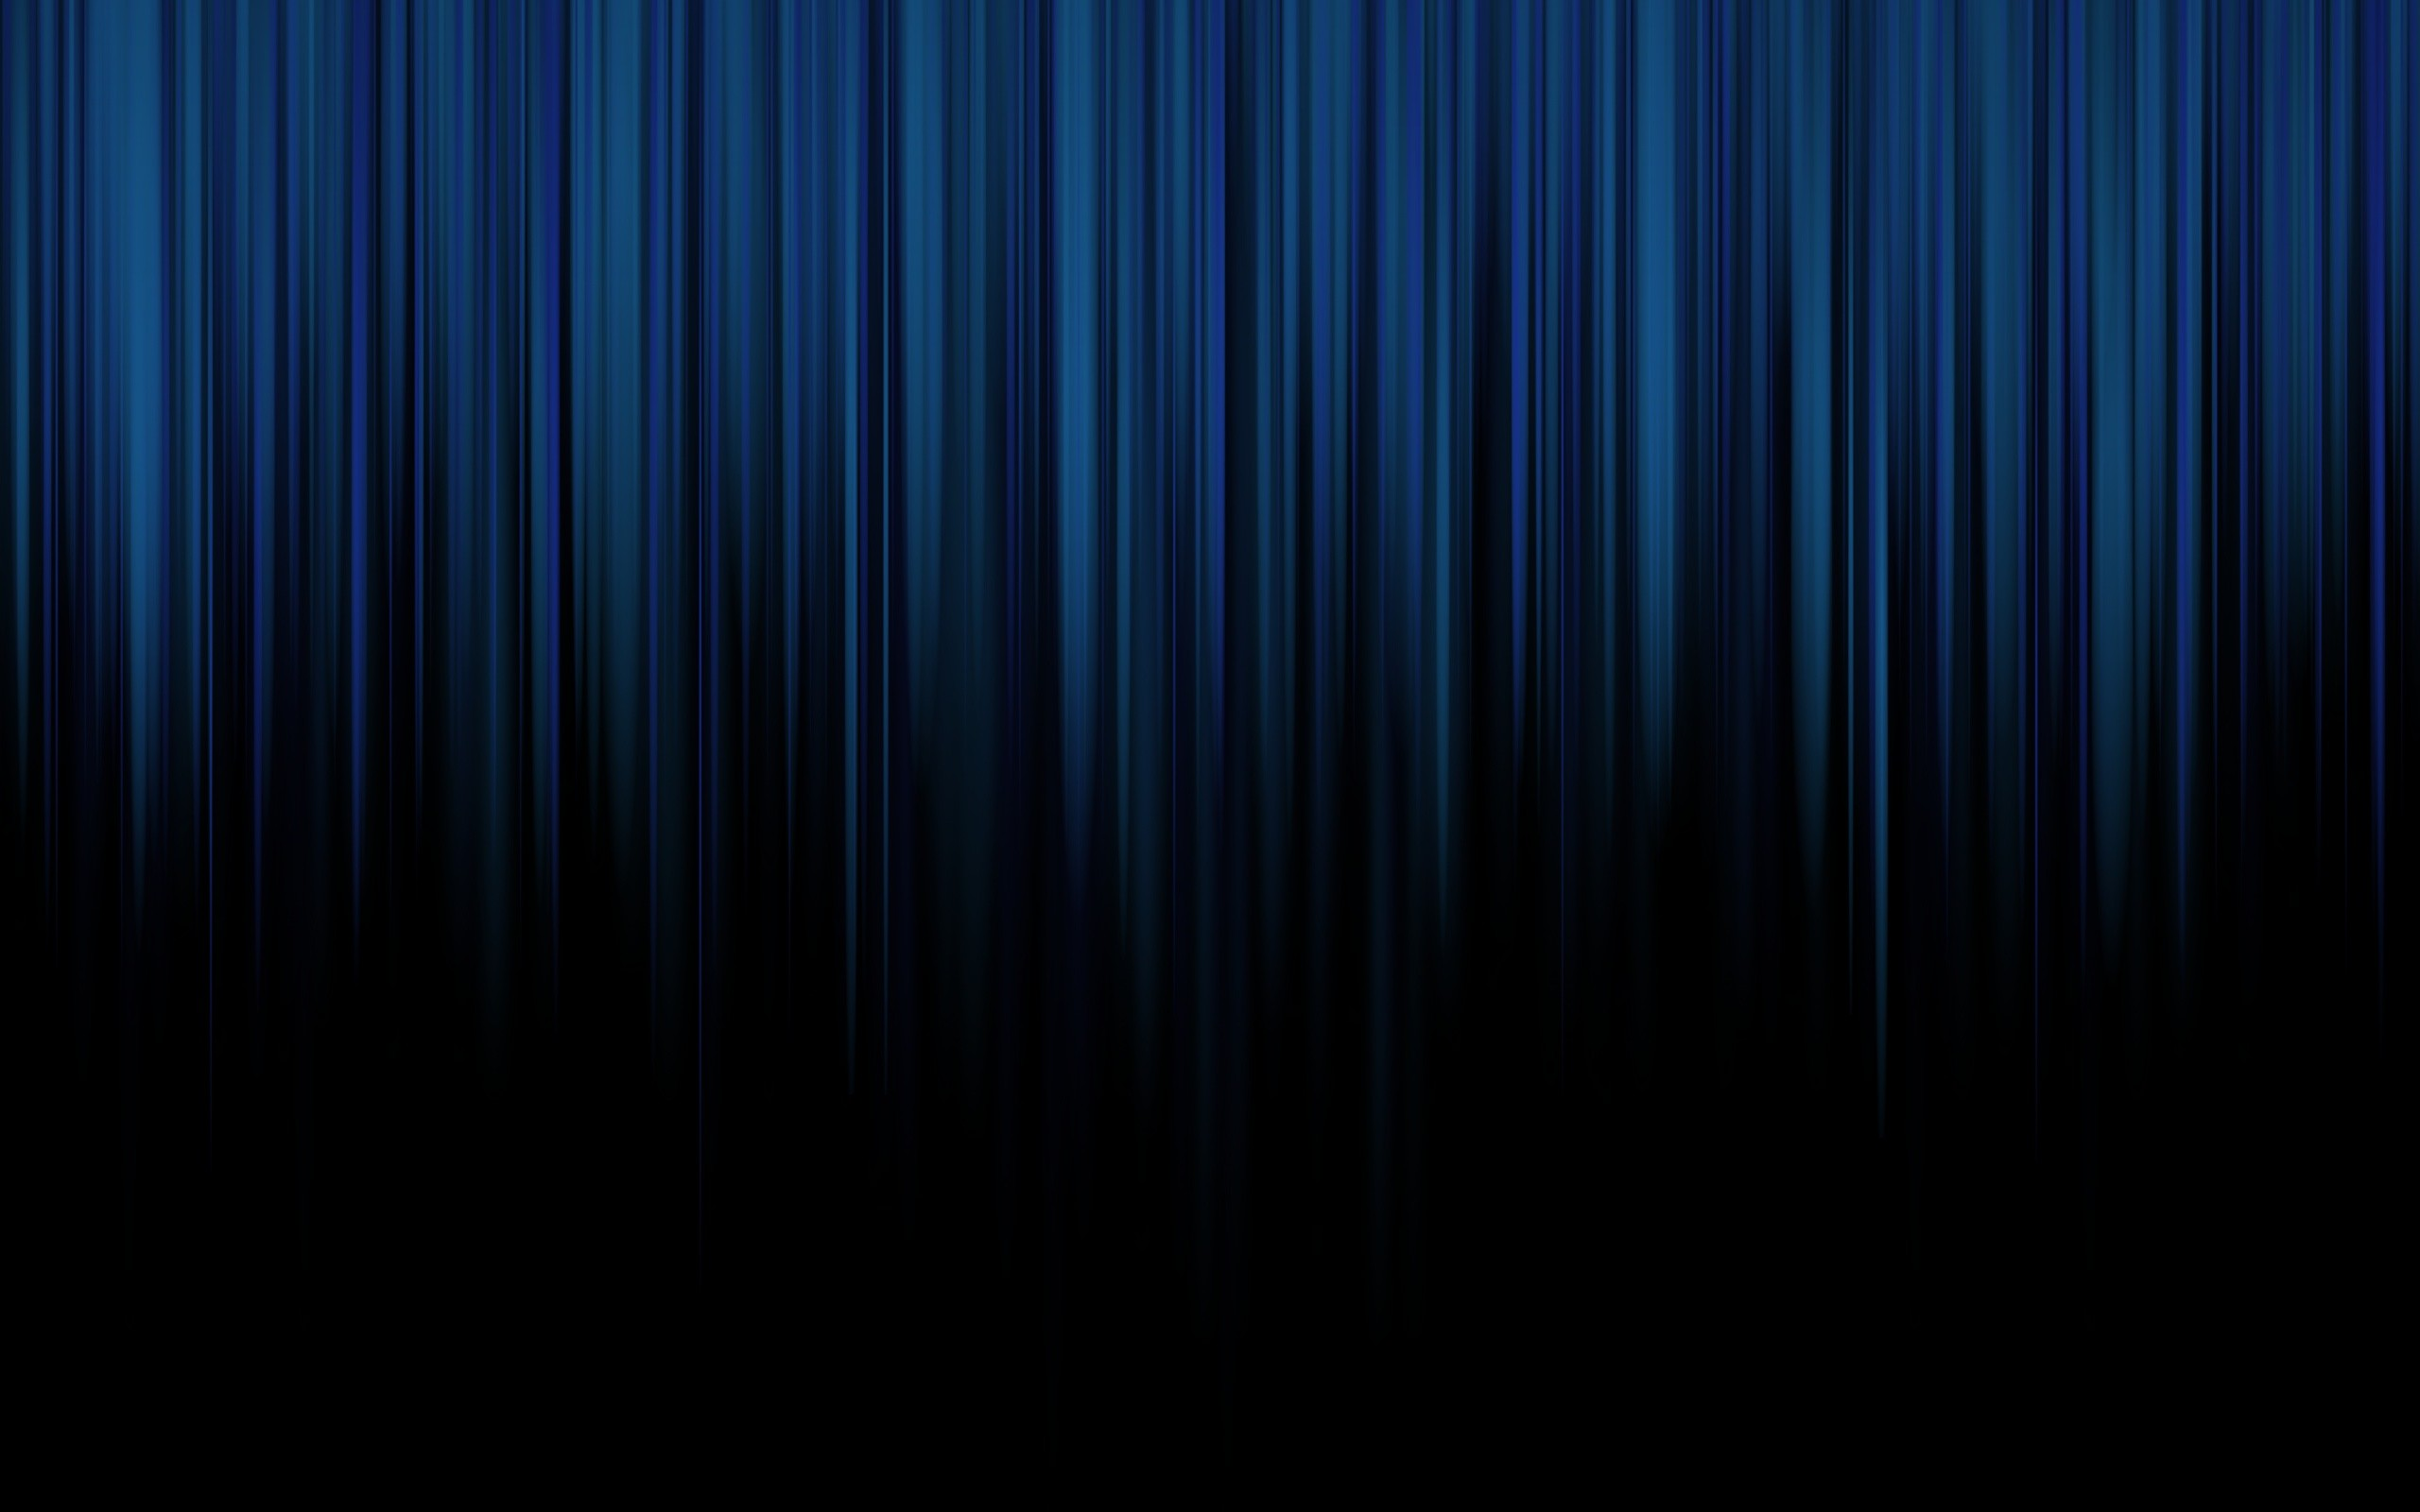 Black And Blue Hd Wallpaper 11 Hd Wallpaper